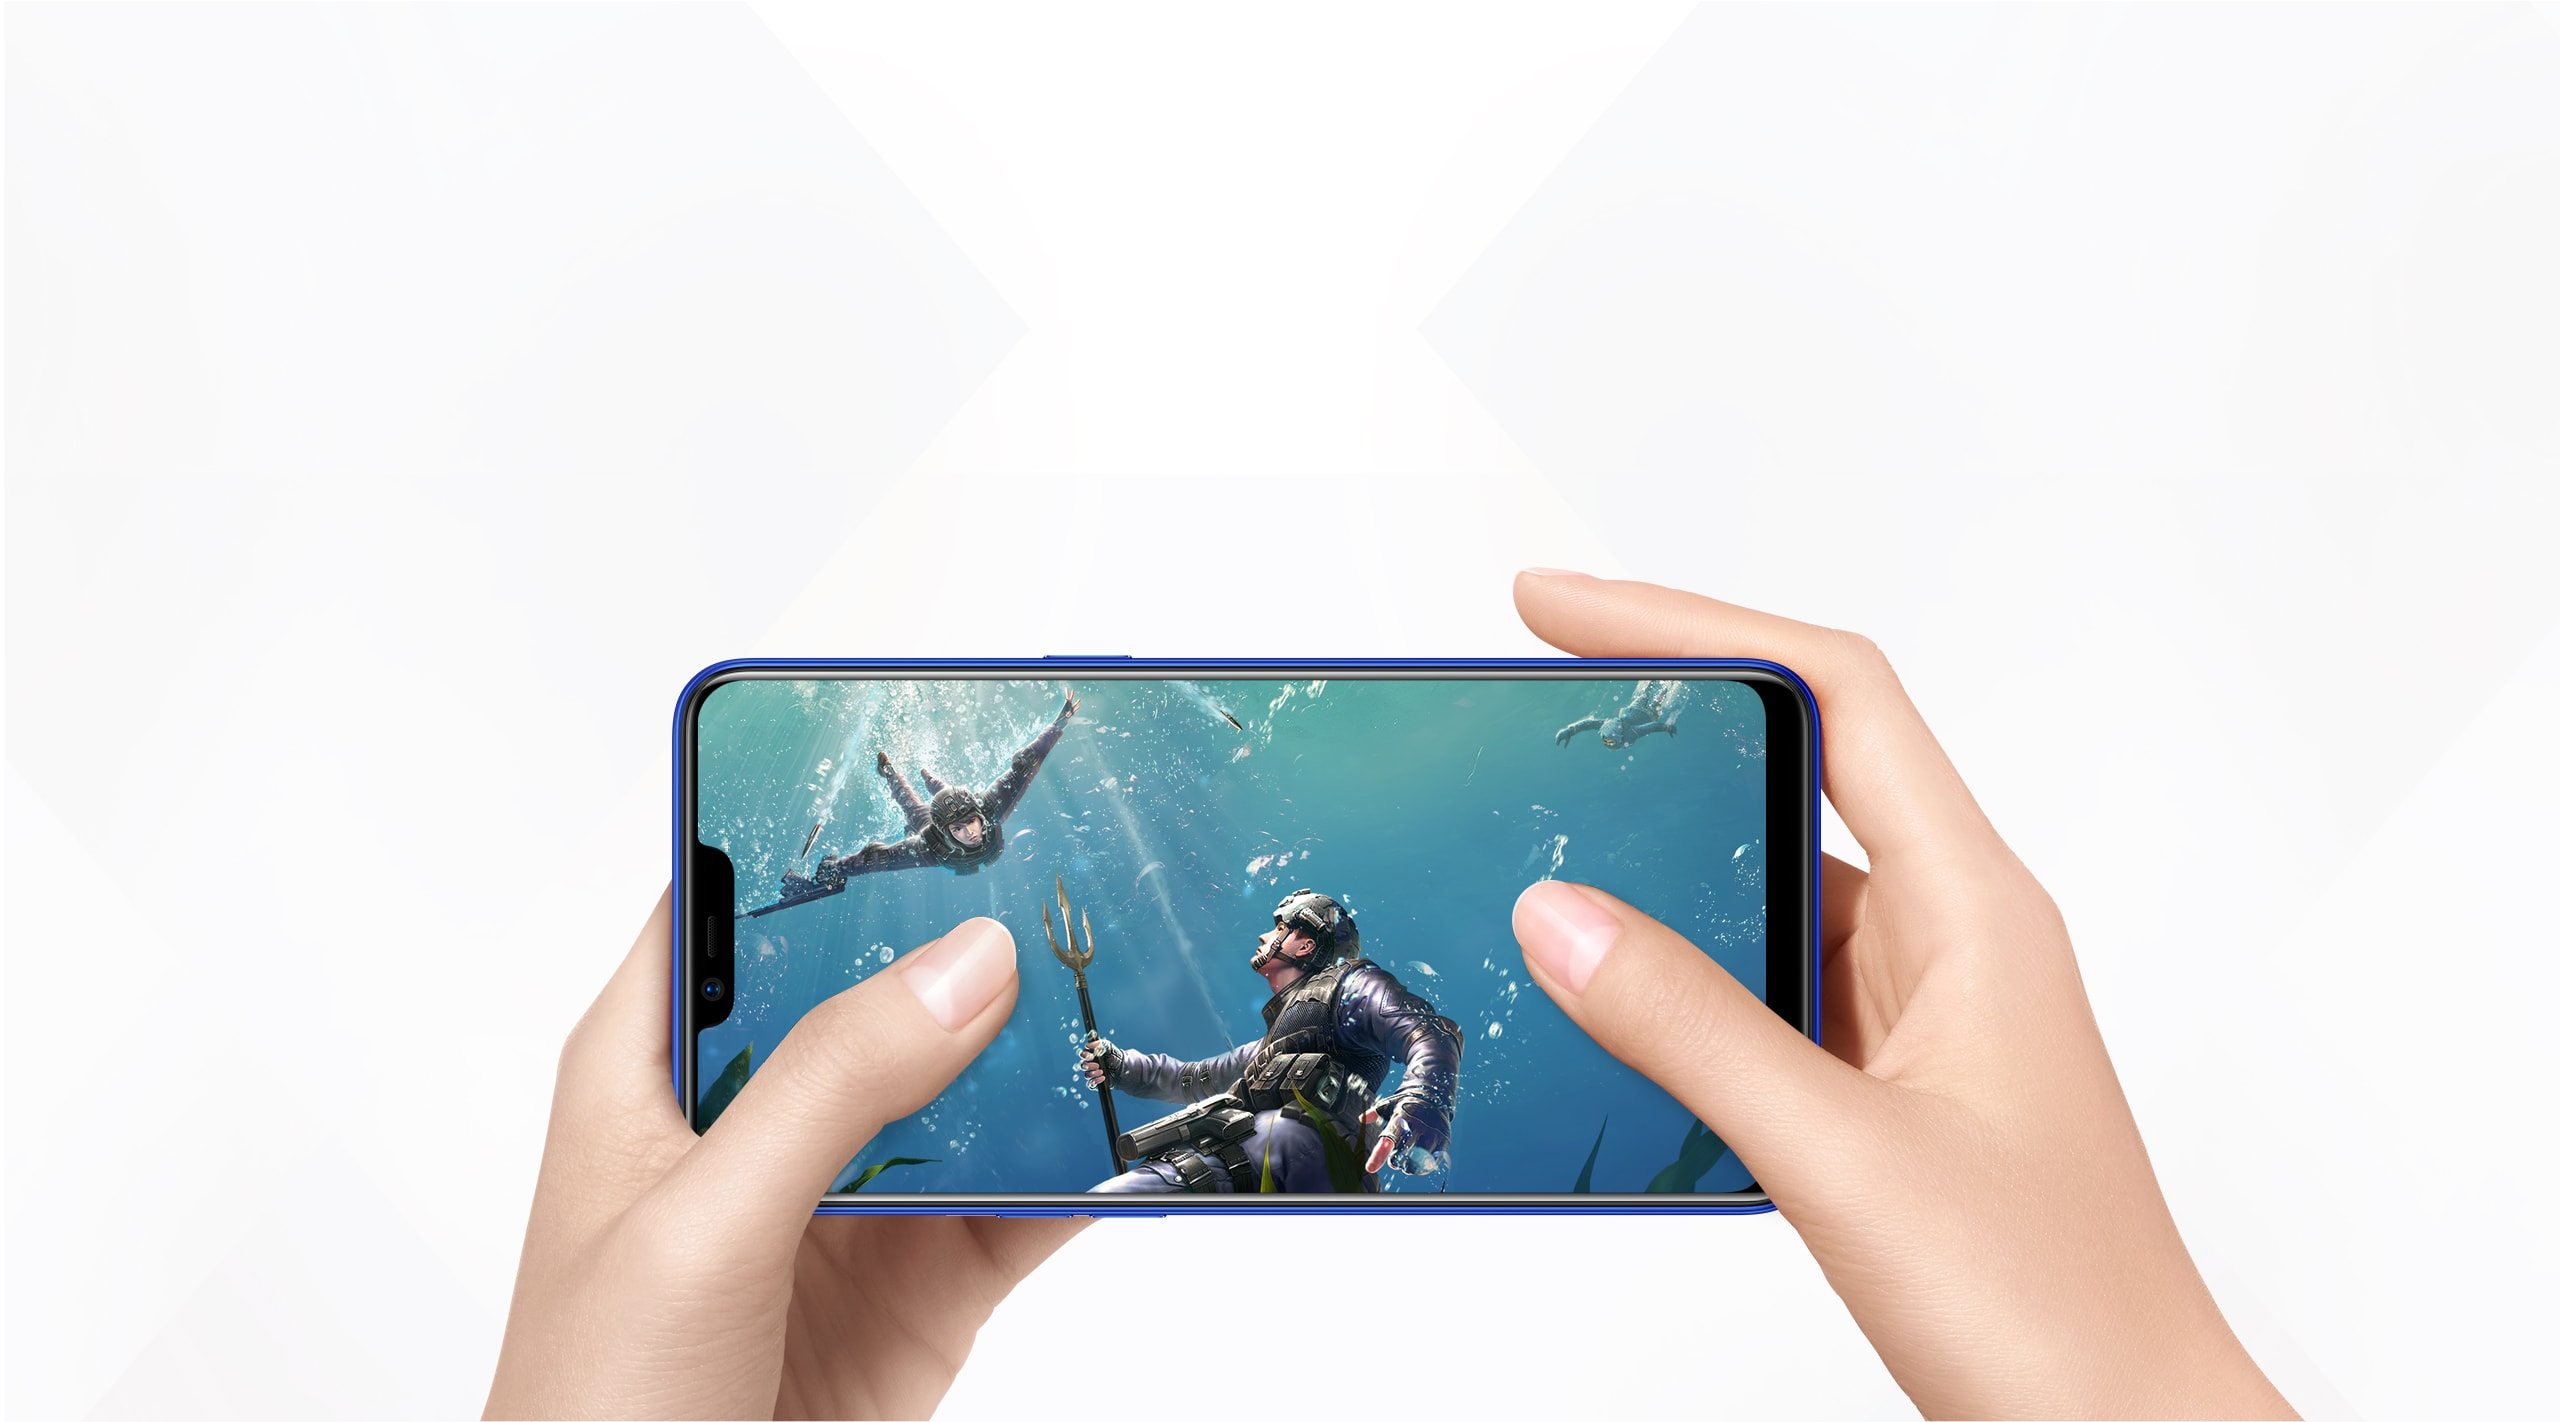 OPPO A5 - Bigger Memory, AI Dual Camera - OPPO Global